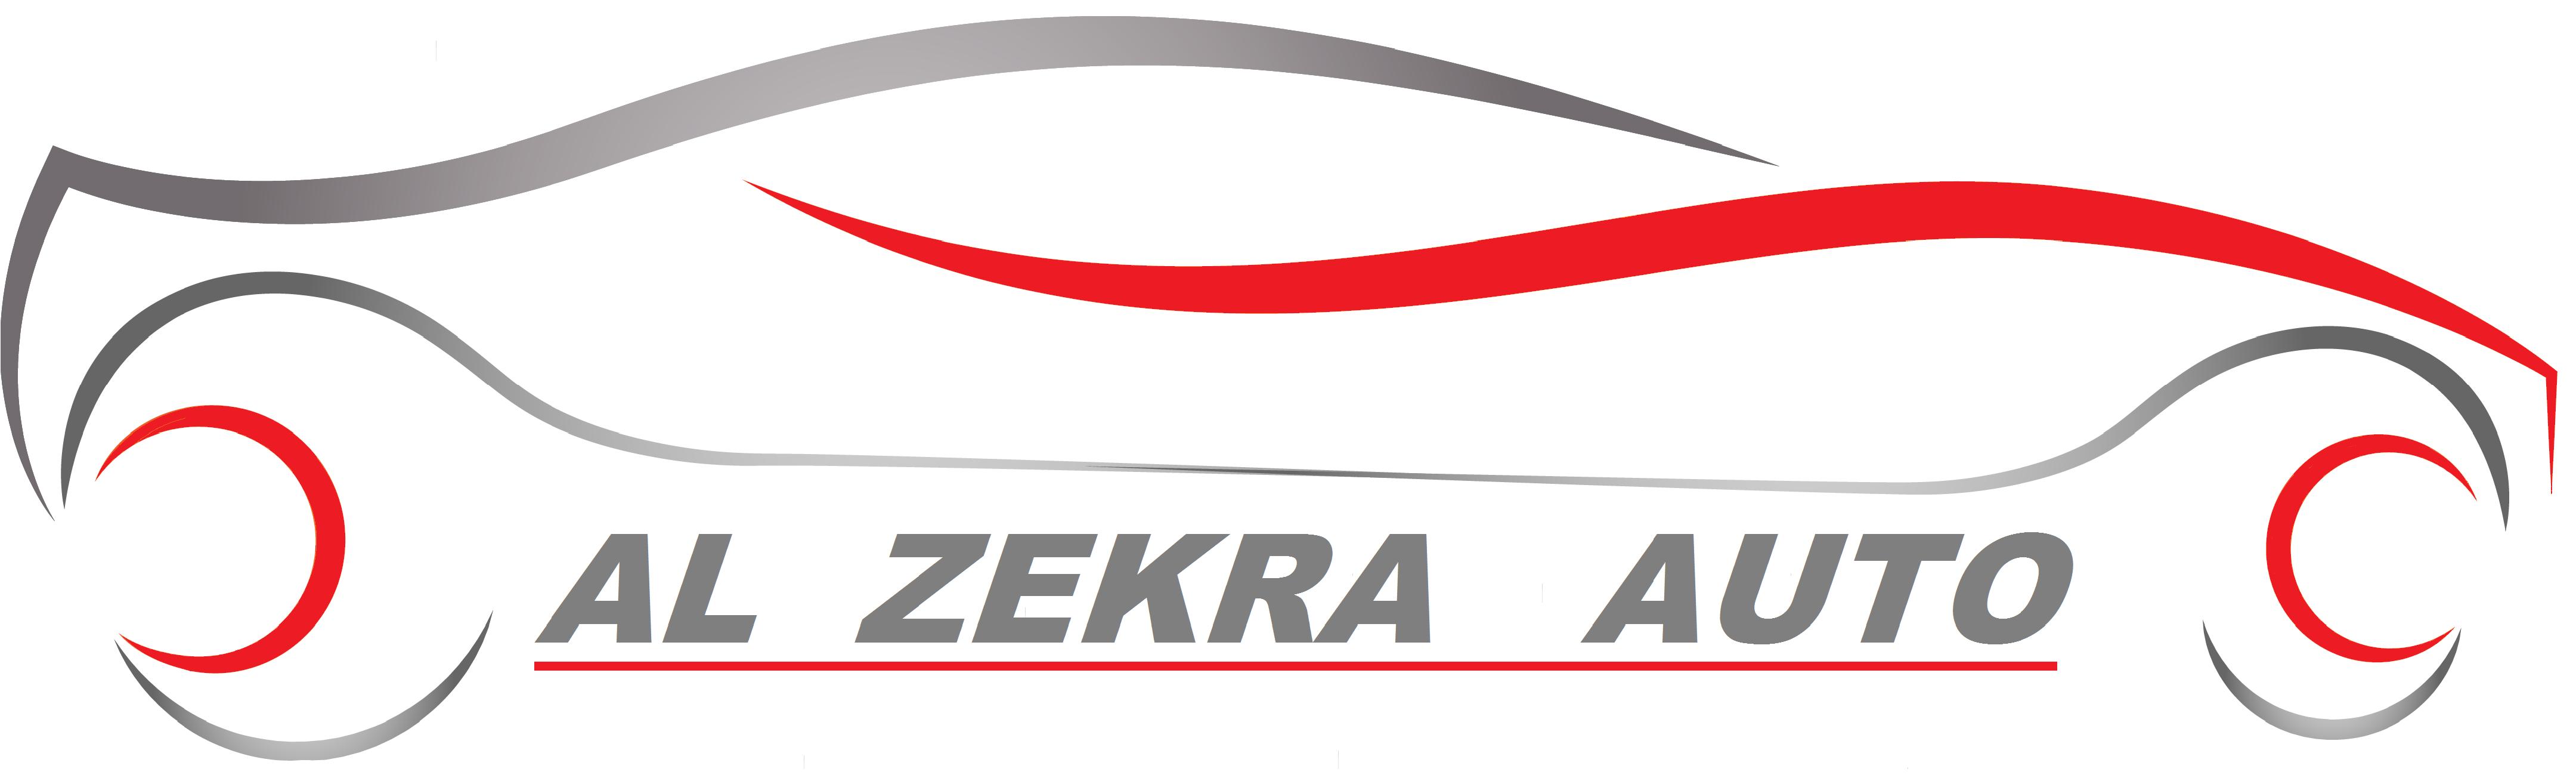 AL ZEKRA AUTO